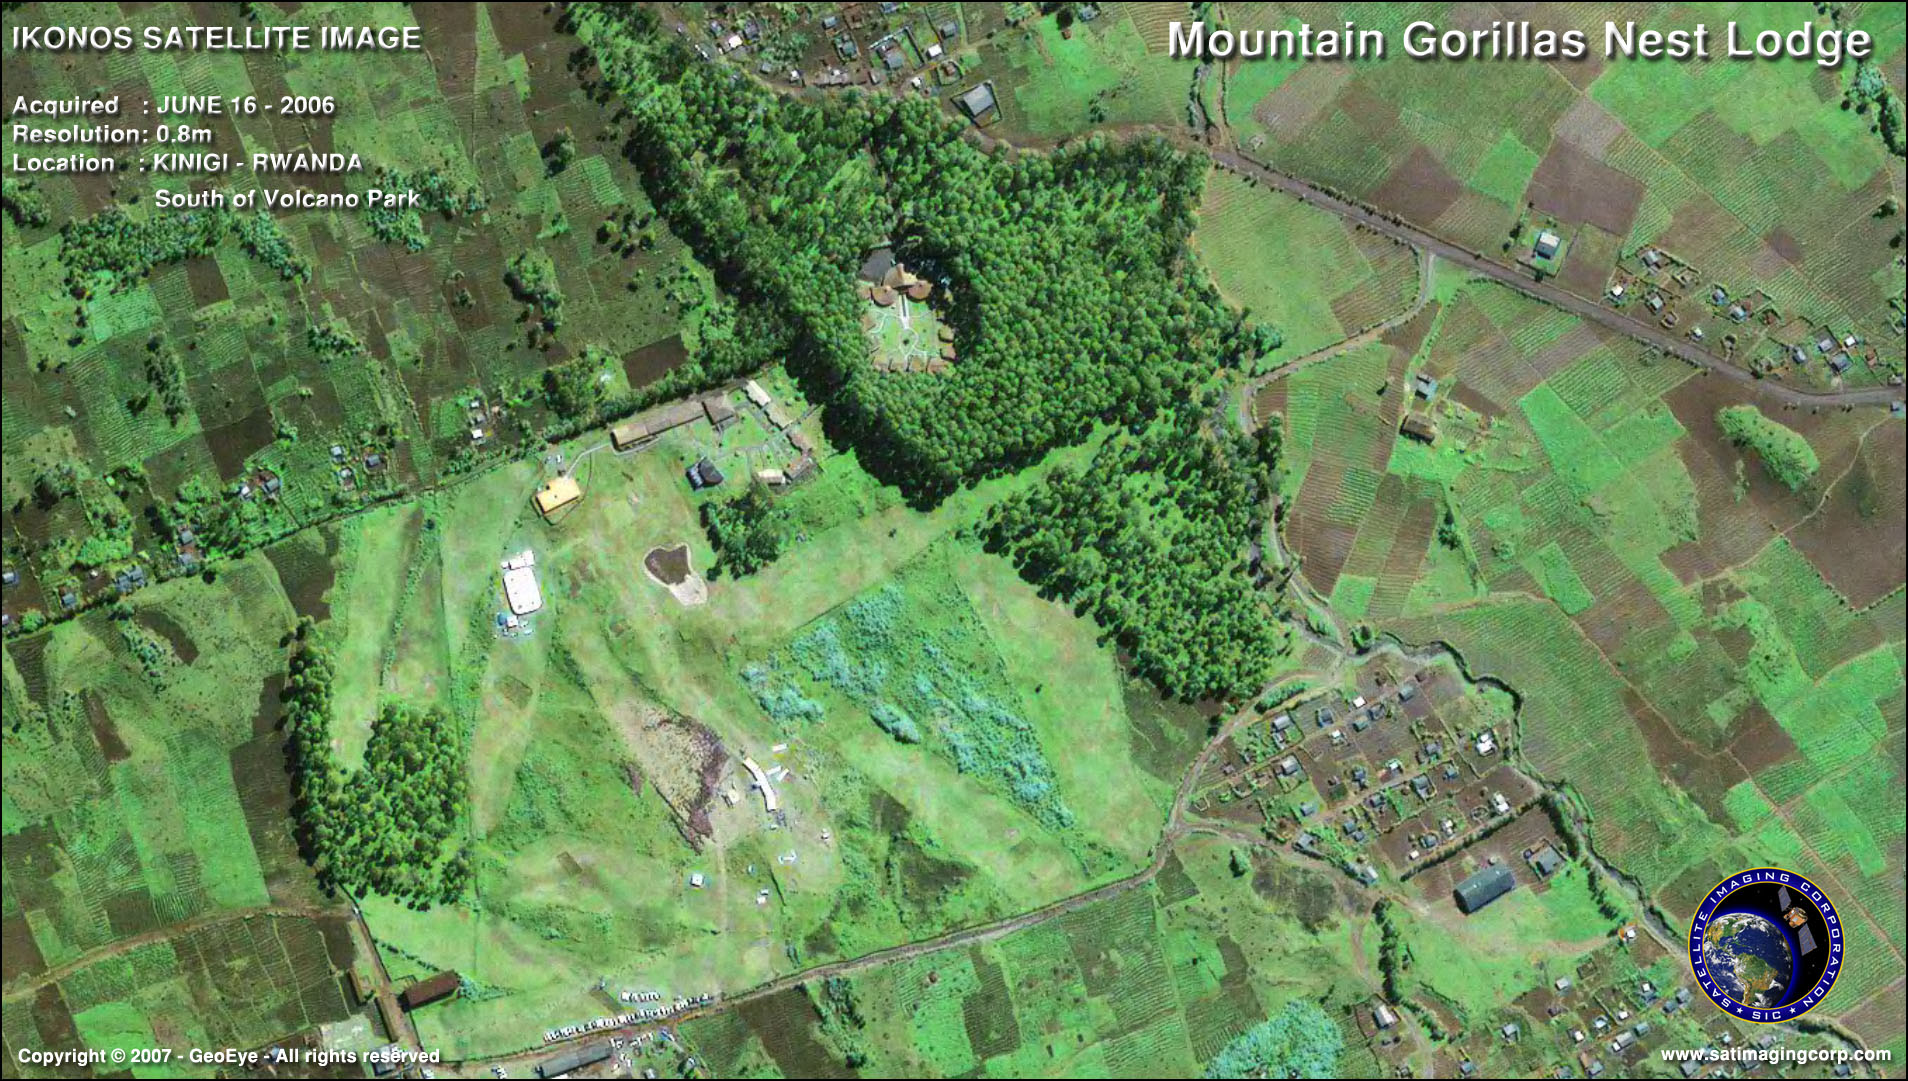 IKONOS Satellite Image of Kinigi, Rwanda   Satellite ...